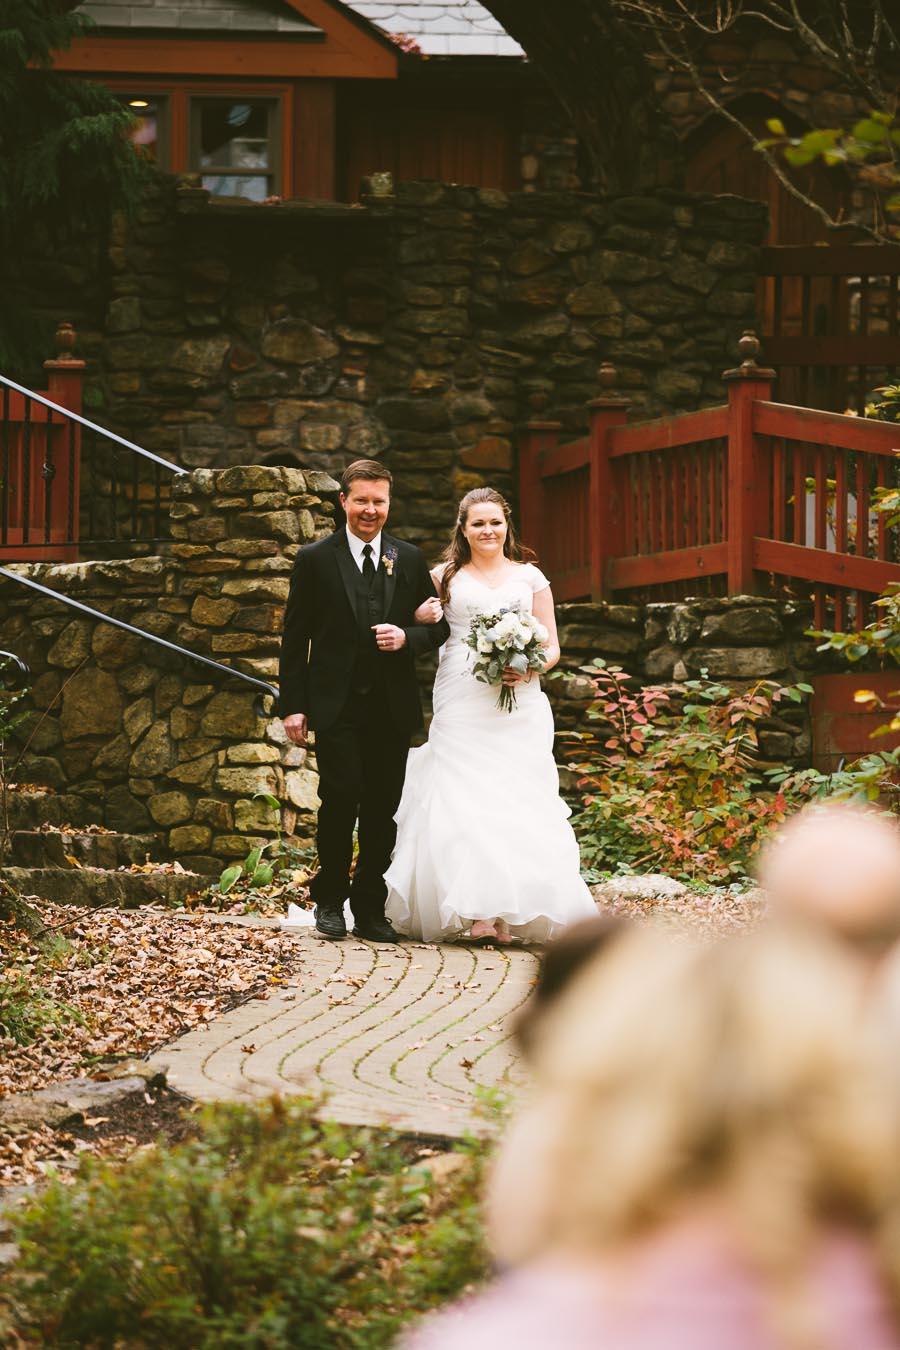 landolls-mohican-castle-wedding-photography-46.jpg